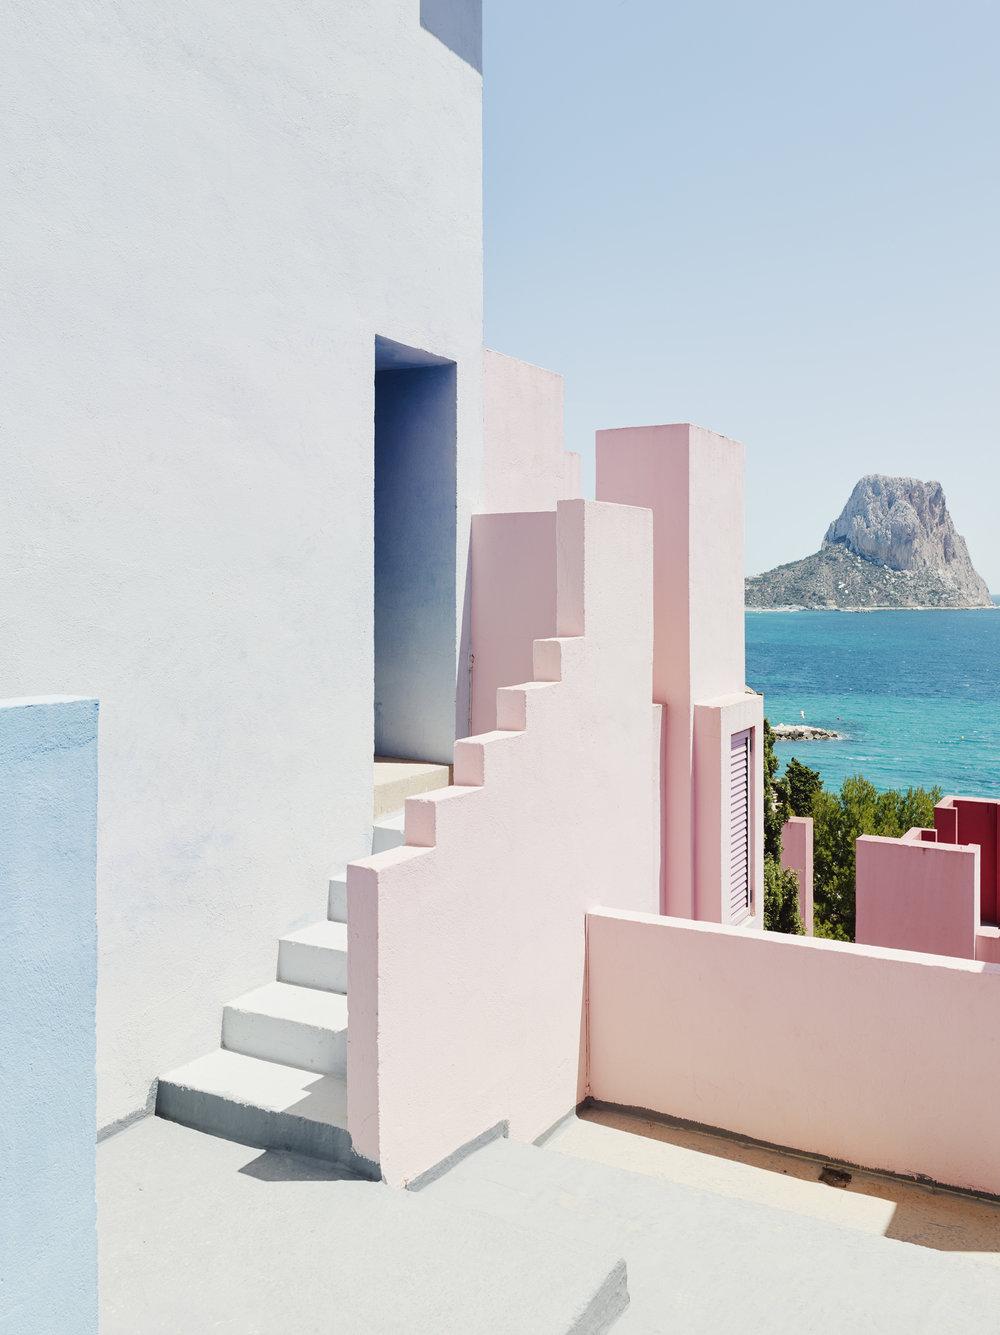 Muralla_Roja_Calpe_Spain_Ricardo_Bofill_Taller_Arquitectura_013.jpg